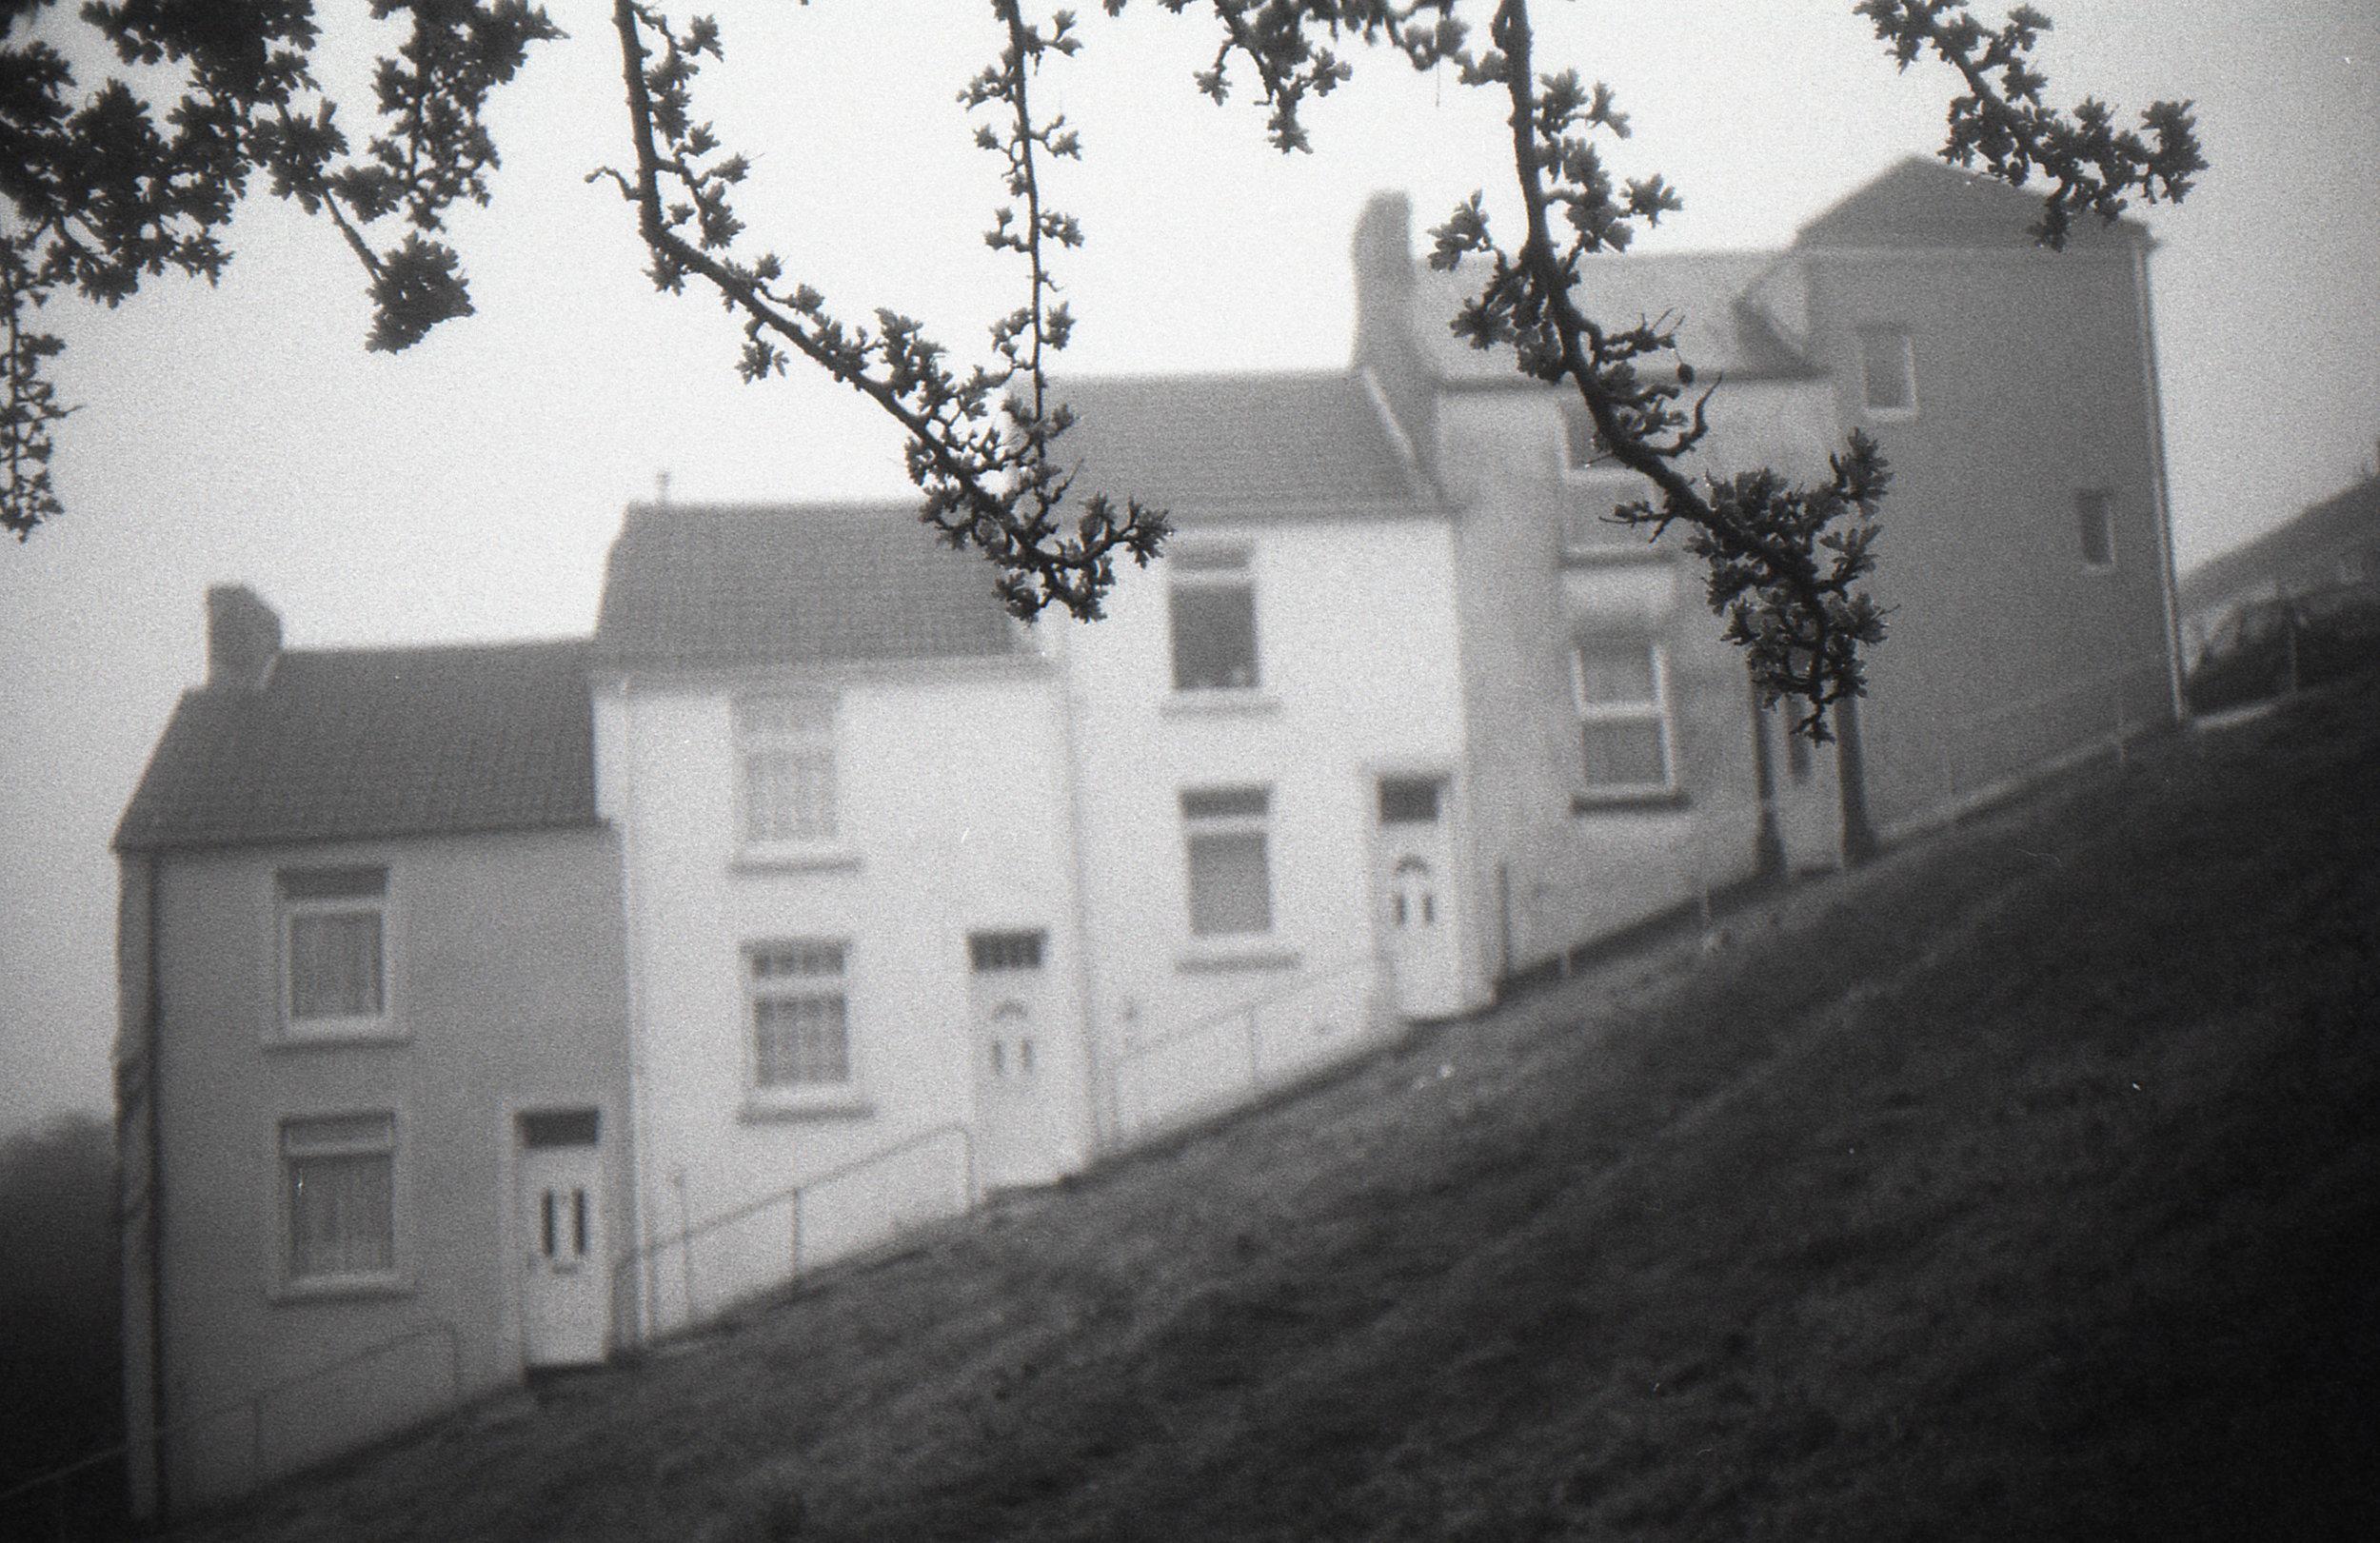 Swansea-1.jpg